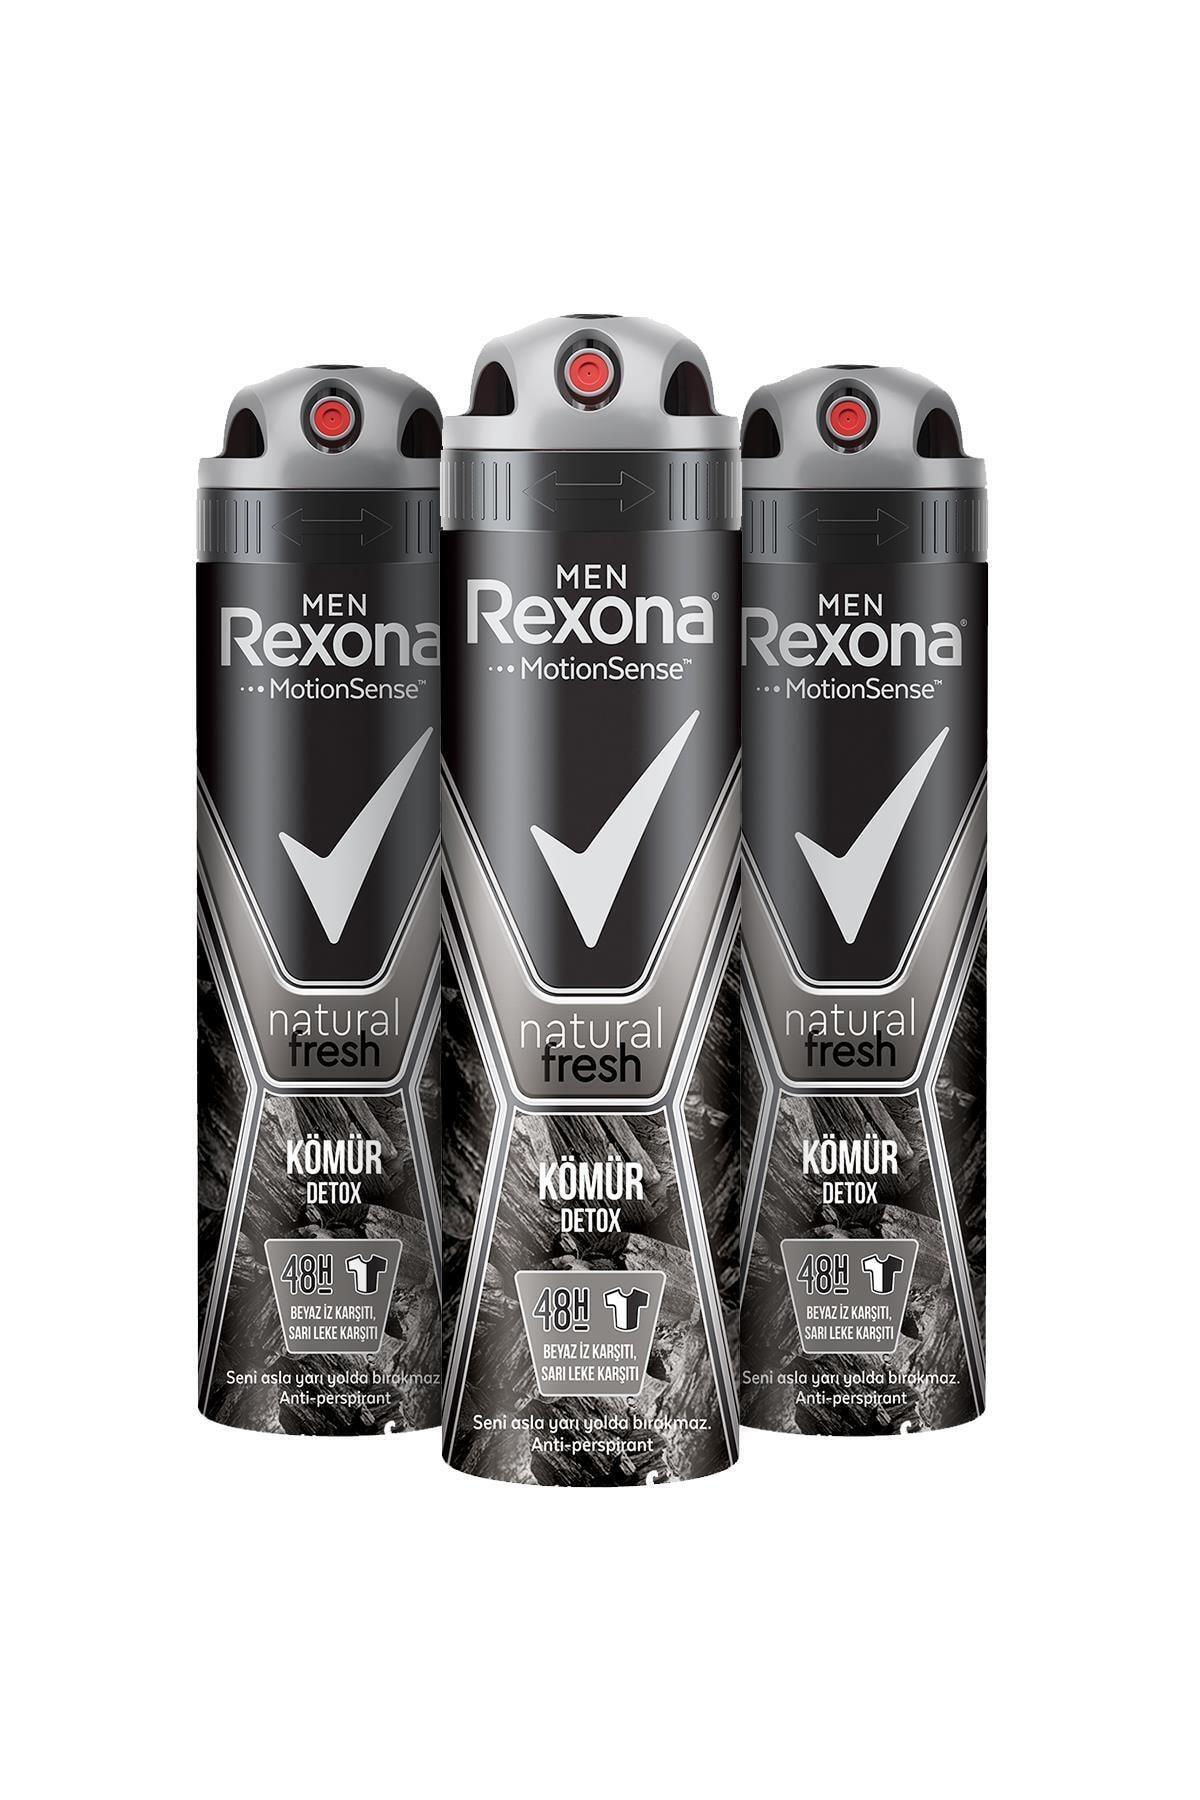 Rexona Men Natural Fresh Kömür Detox Erkek Sprey Deodorant 150 ml X 3 1